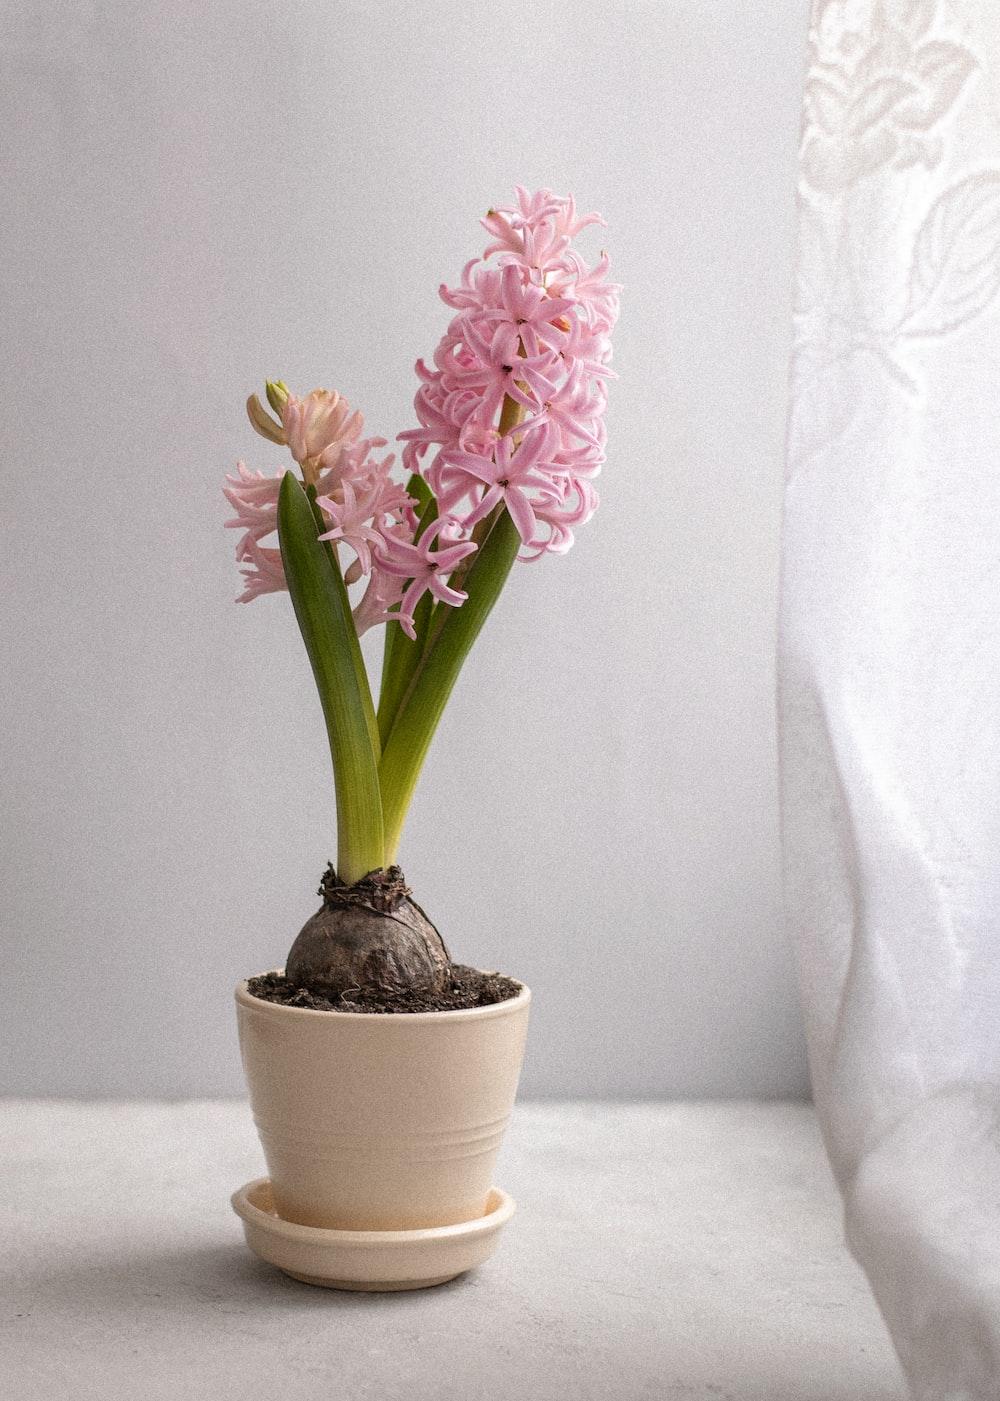 purple flowers in white ceramic pot